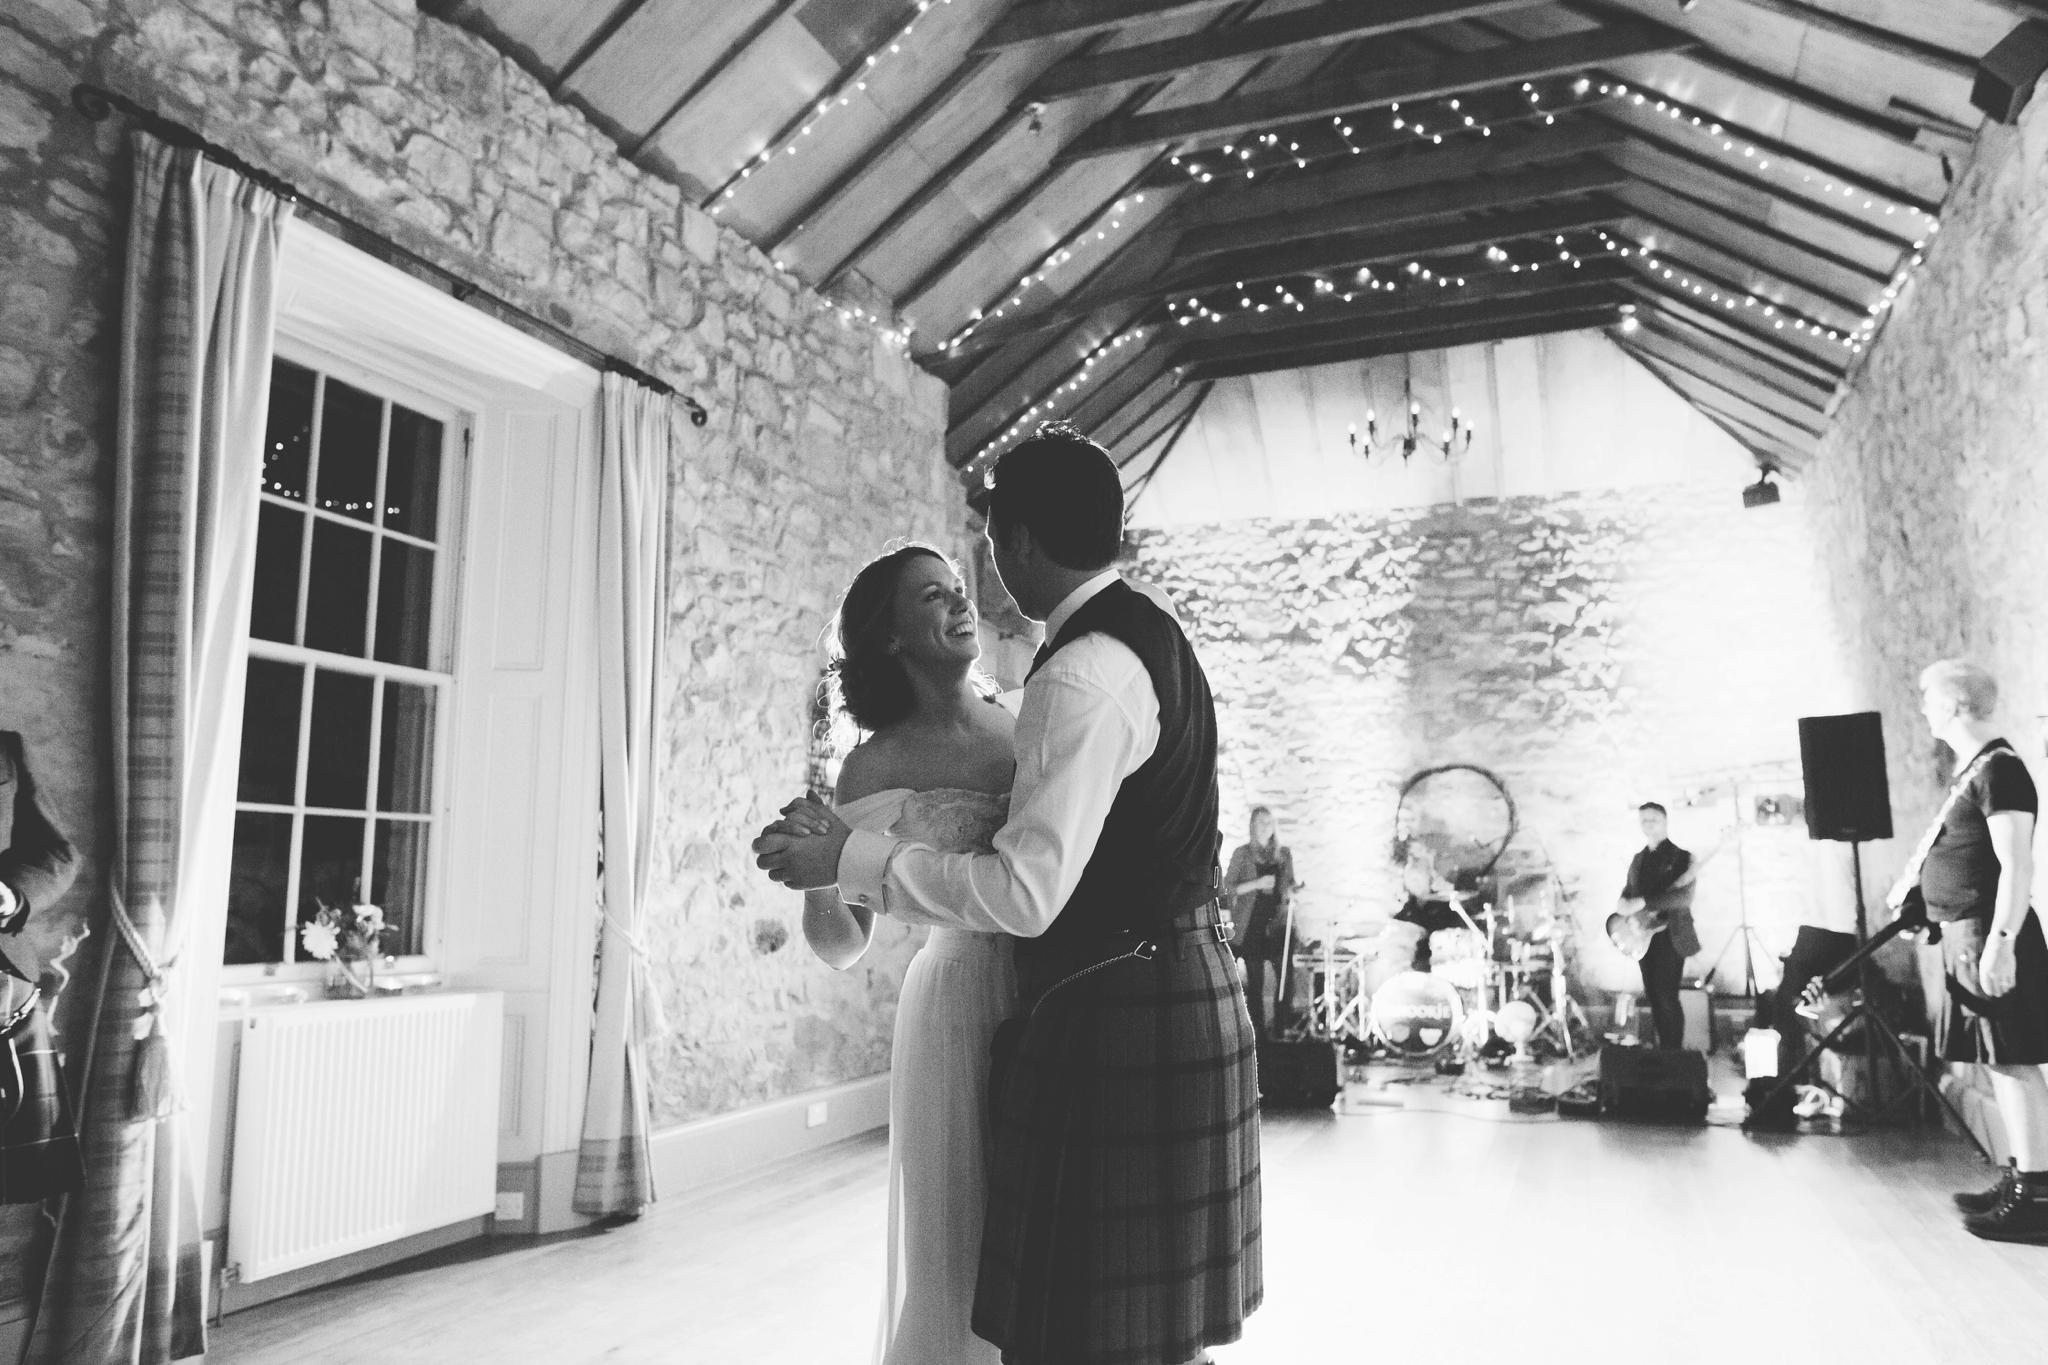 Suzanne_li_photography_kirknewton_wedding_0071.jpg